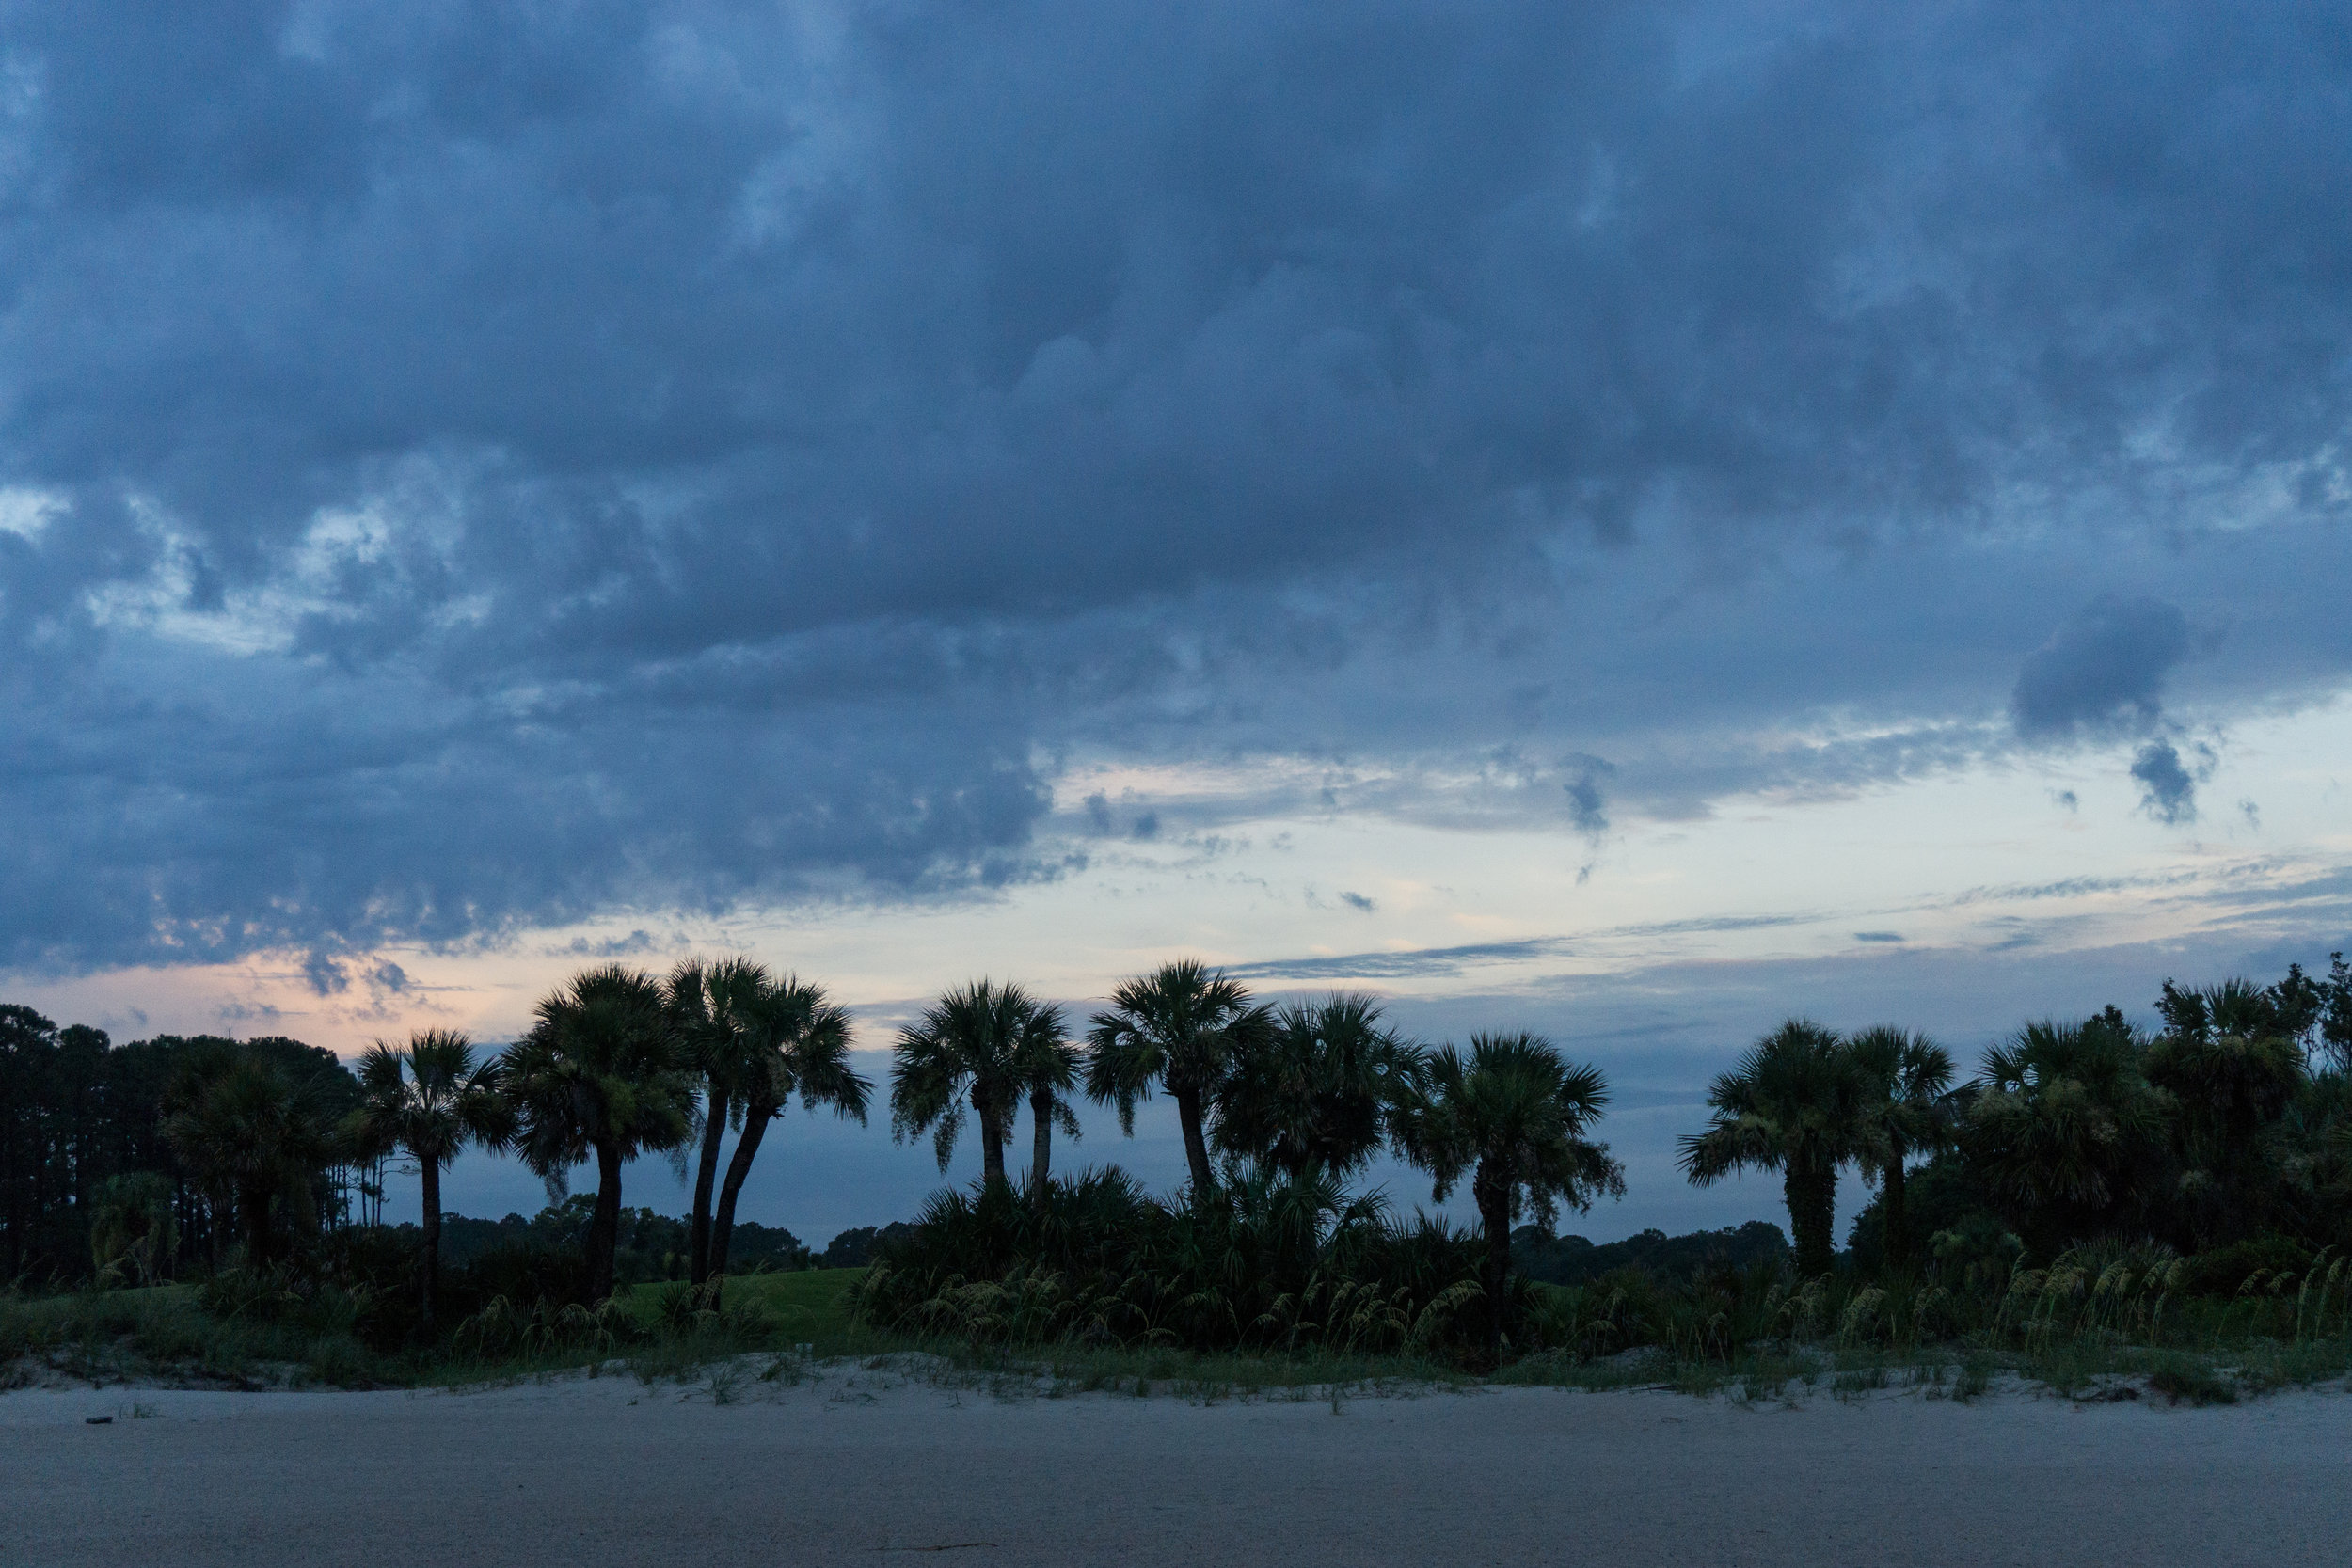 Palm trees before sunset on Hilton Head Island